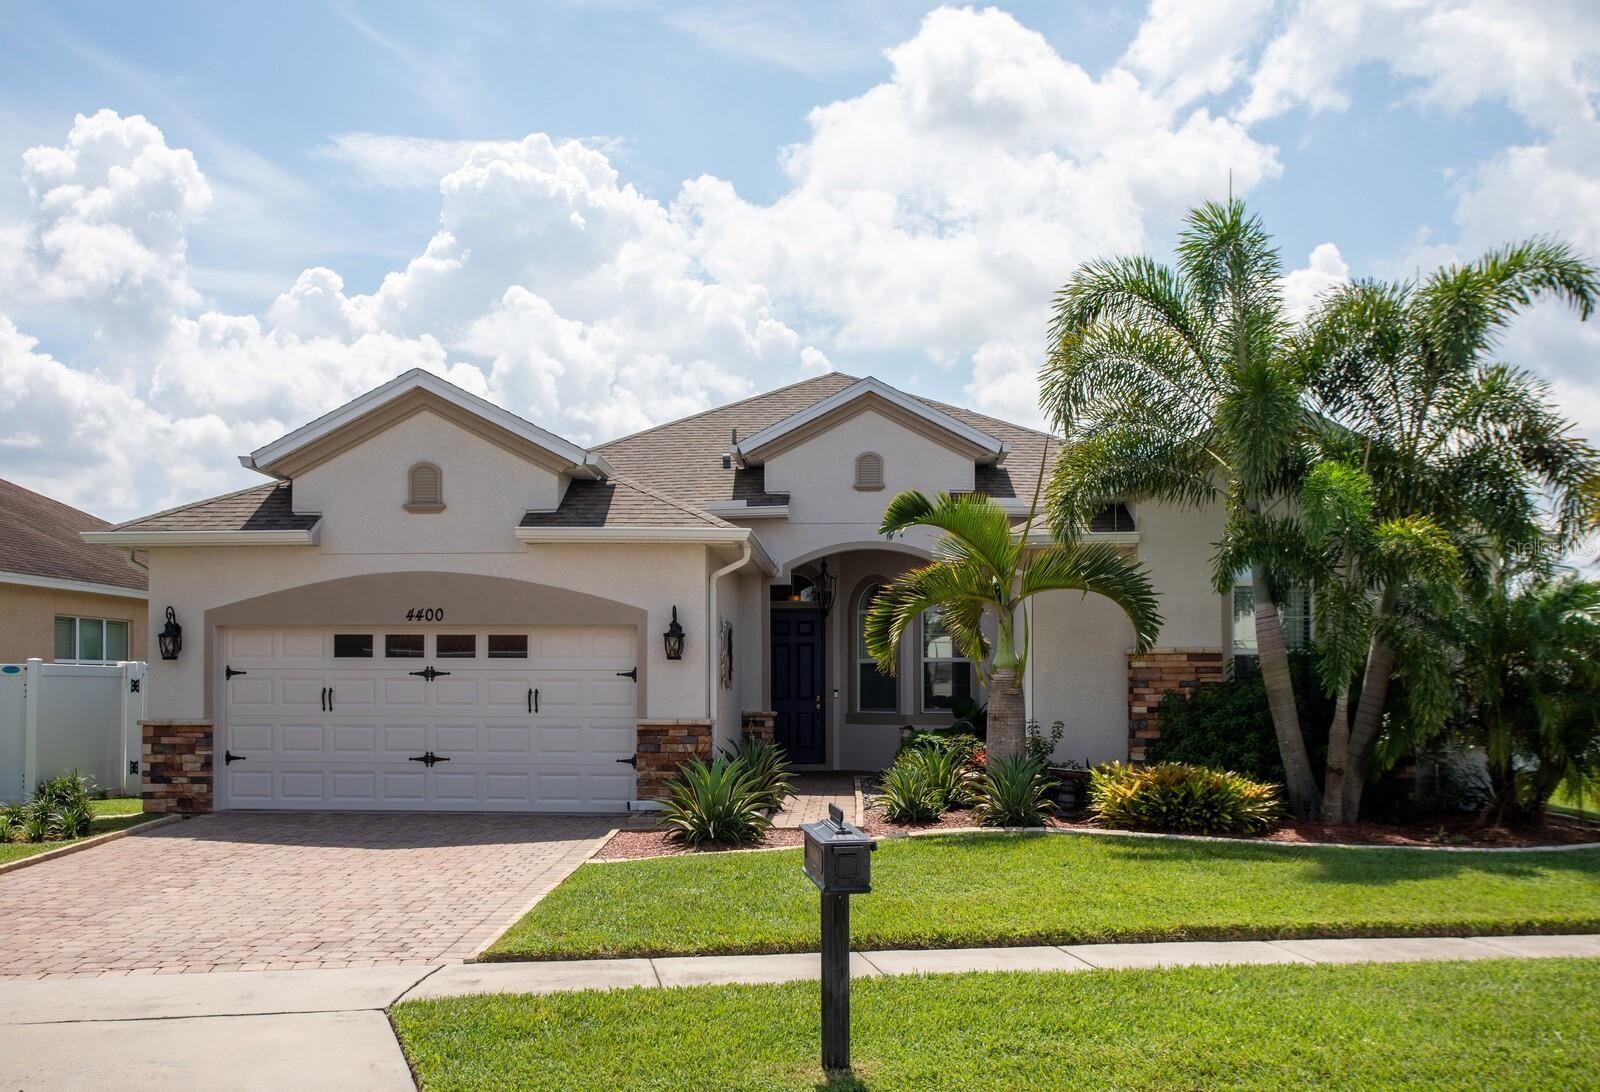 4400 ERIE STREET, Clermont, FL 34714 - MLS#: O5962015